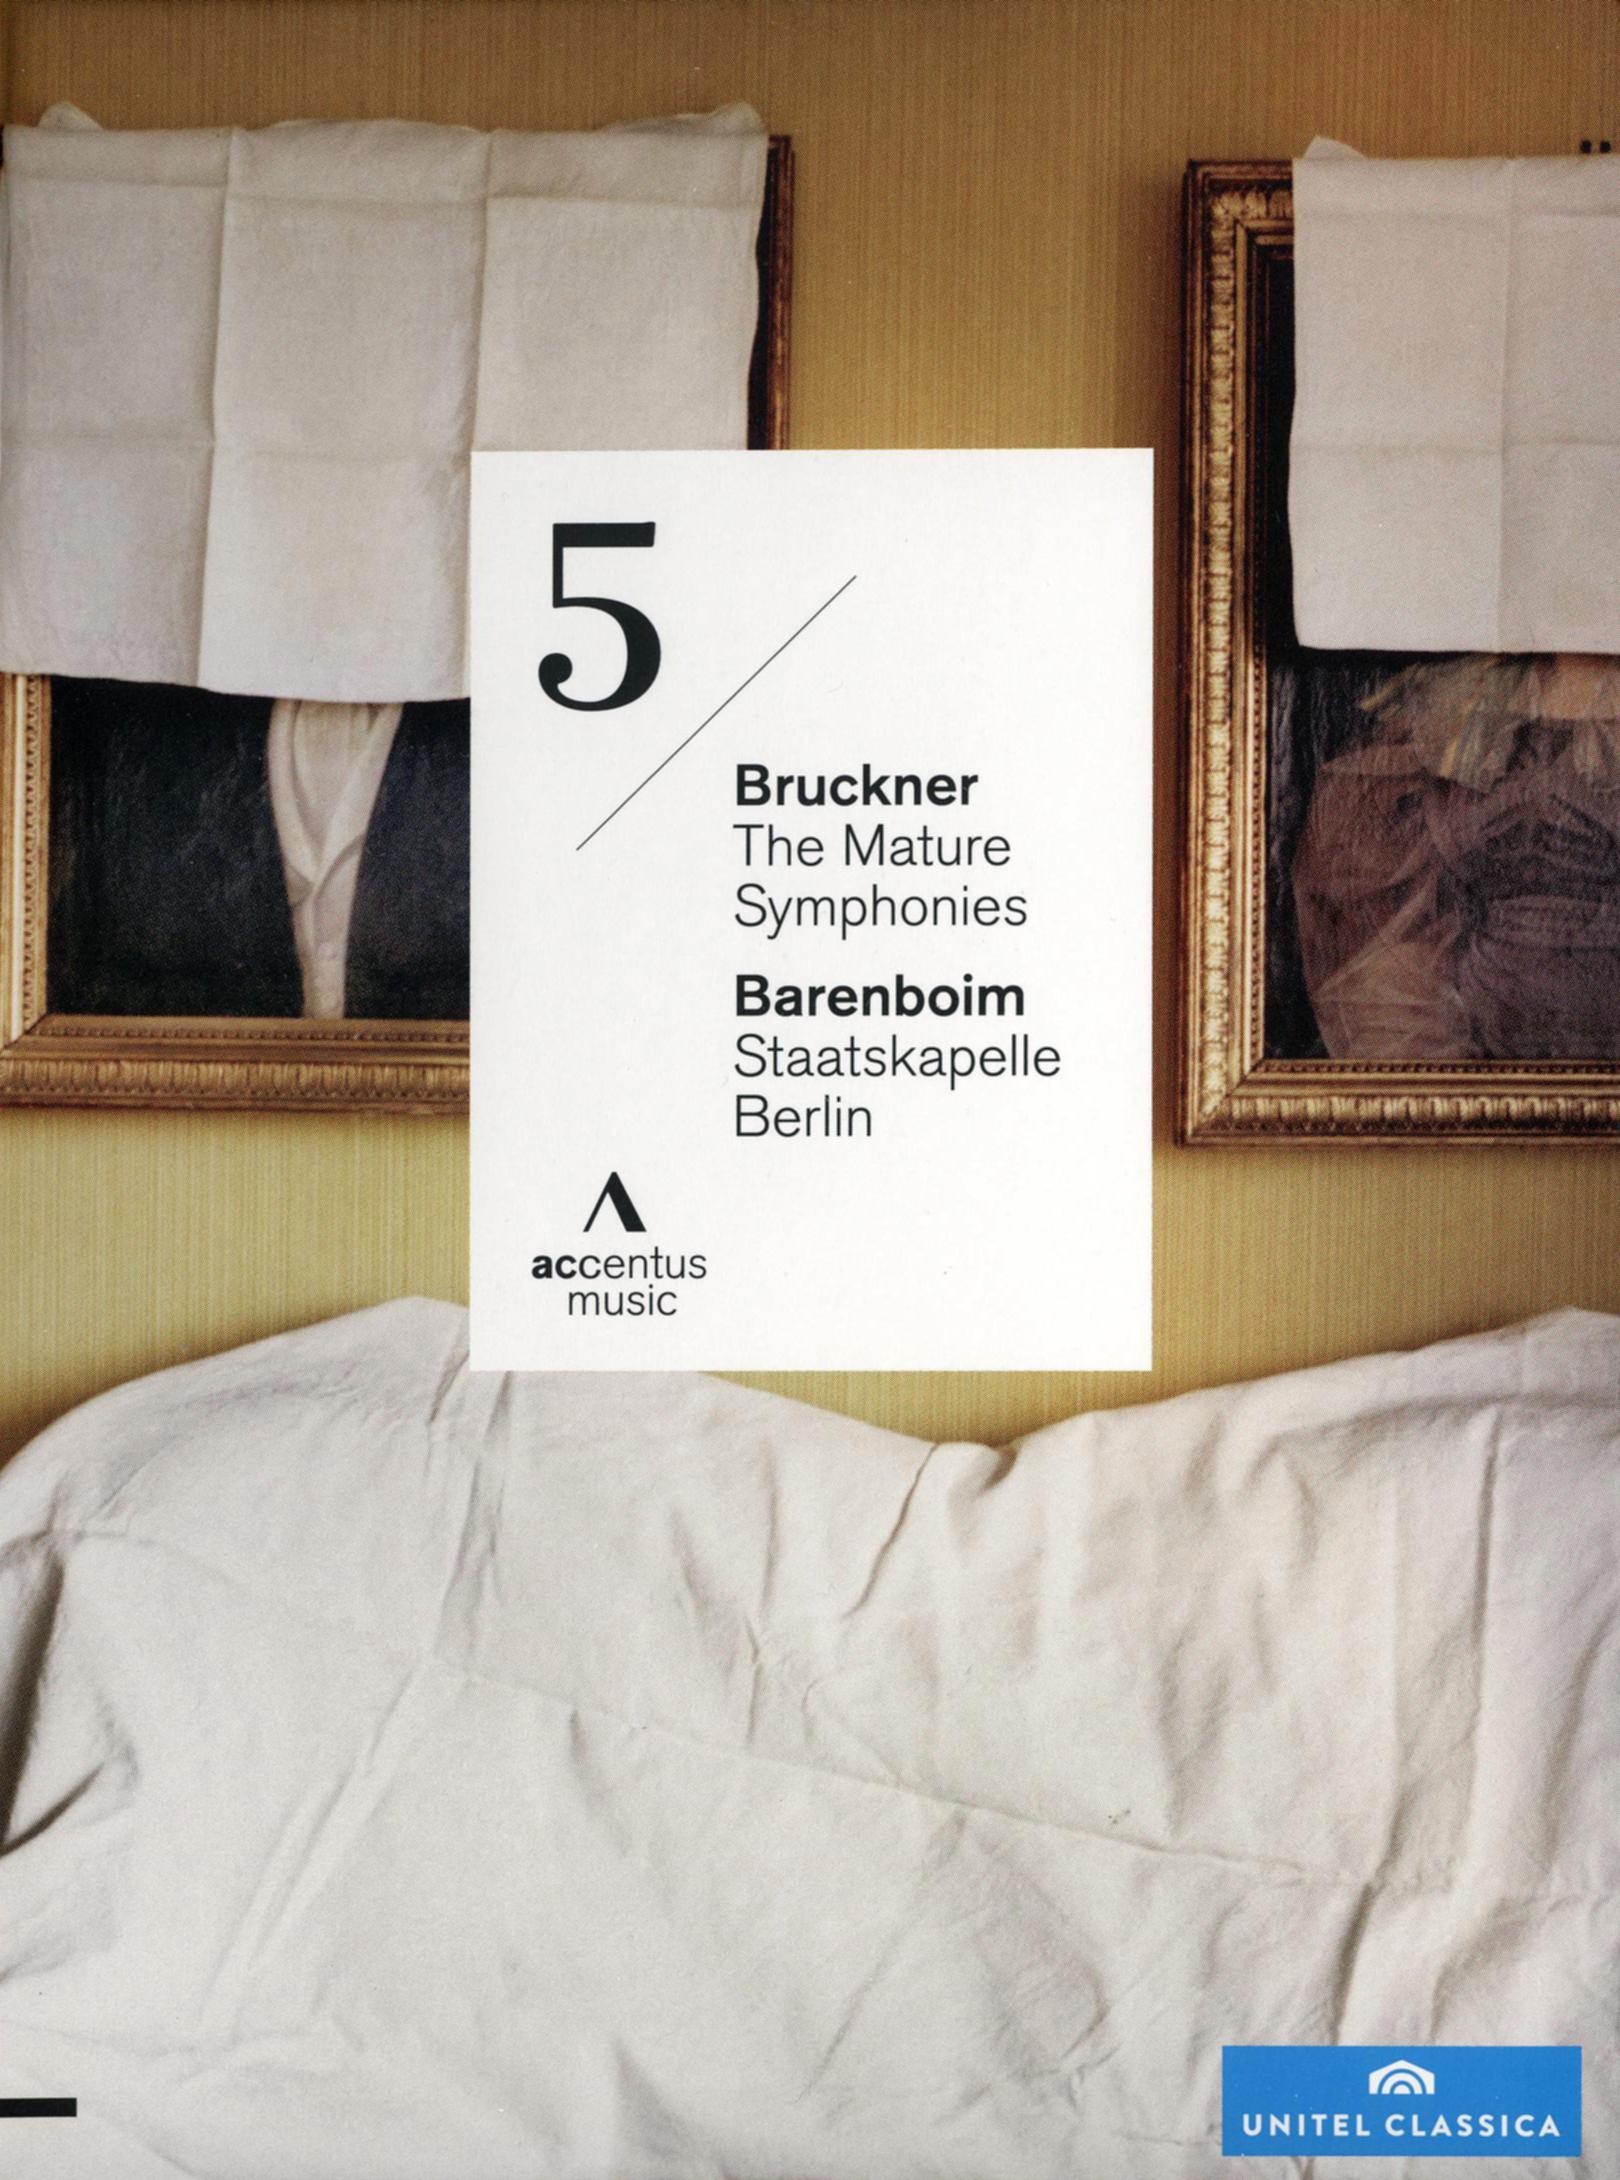 Barenboim/Staatskapelle Berlin: Bruckner - The Mature Symphonies, No. 5